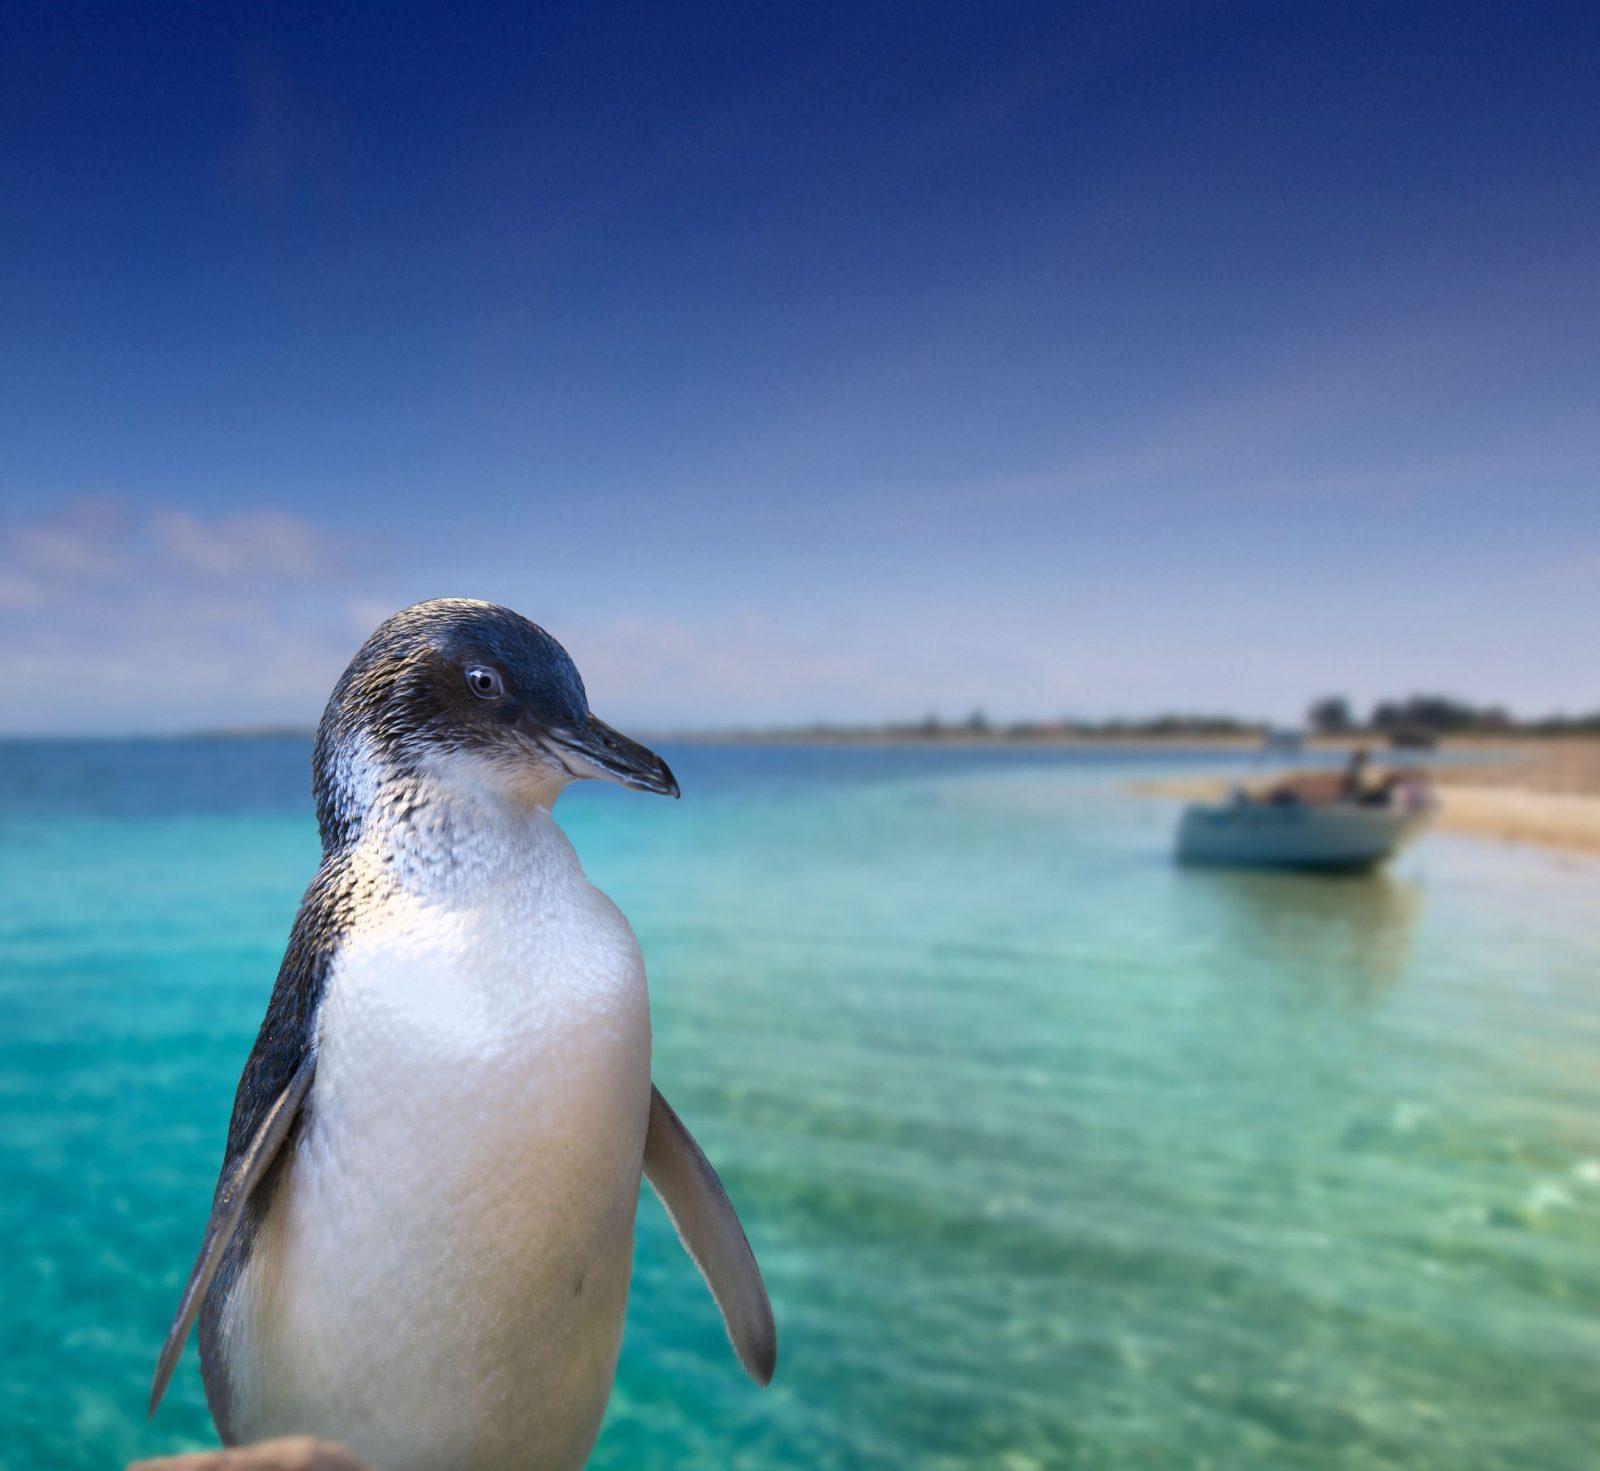 Rockingham Wild Encounters - Penguin Island Ferry and Cruises, Rockingham, Western Australia